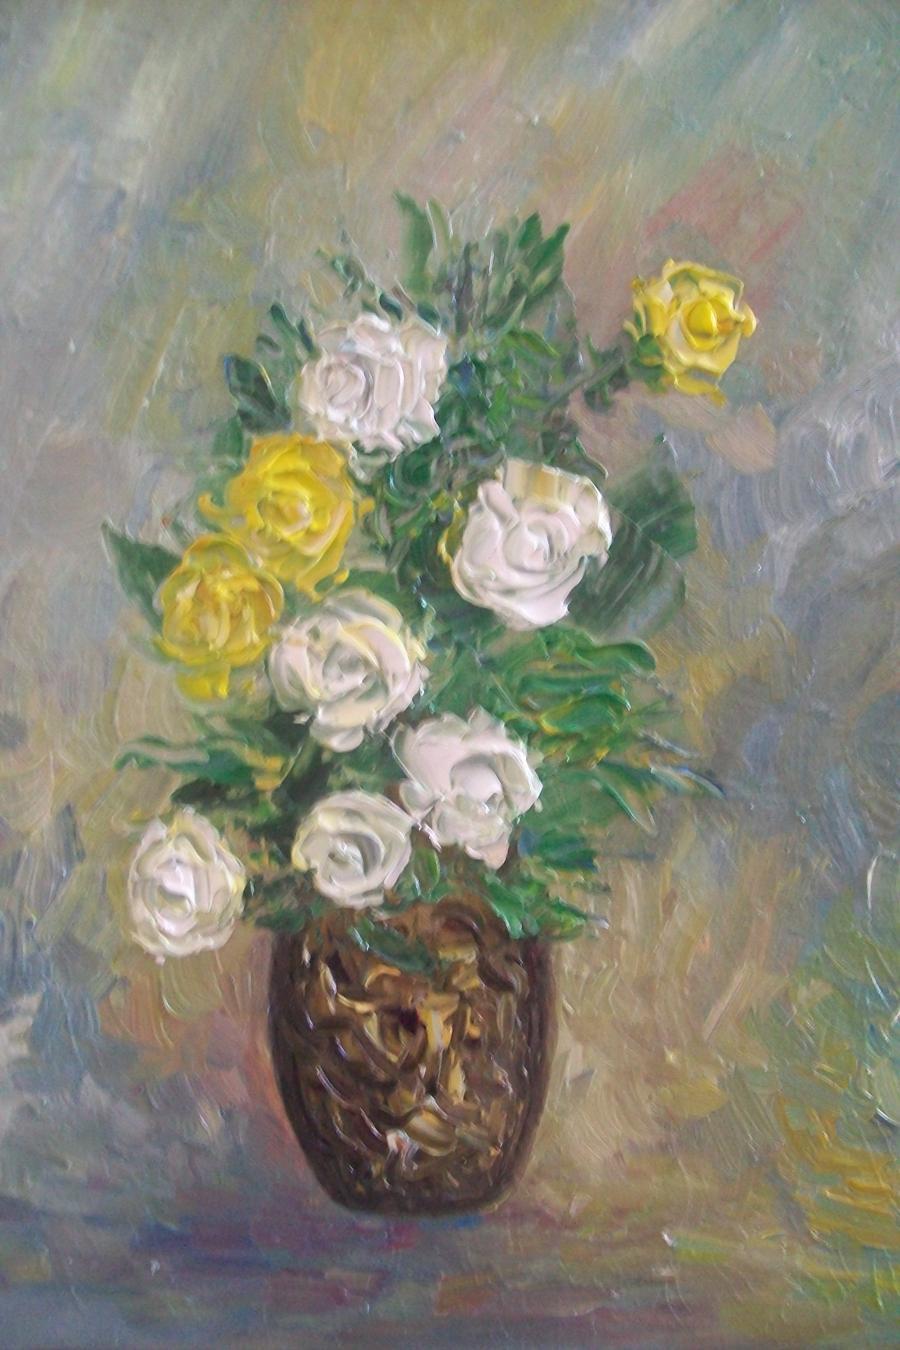 Picturi cu flori Putina fantezie